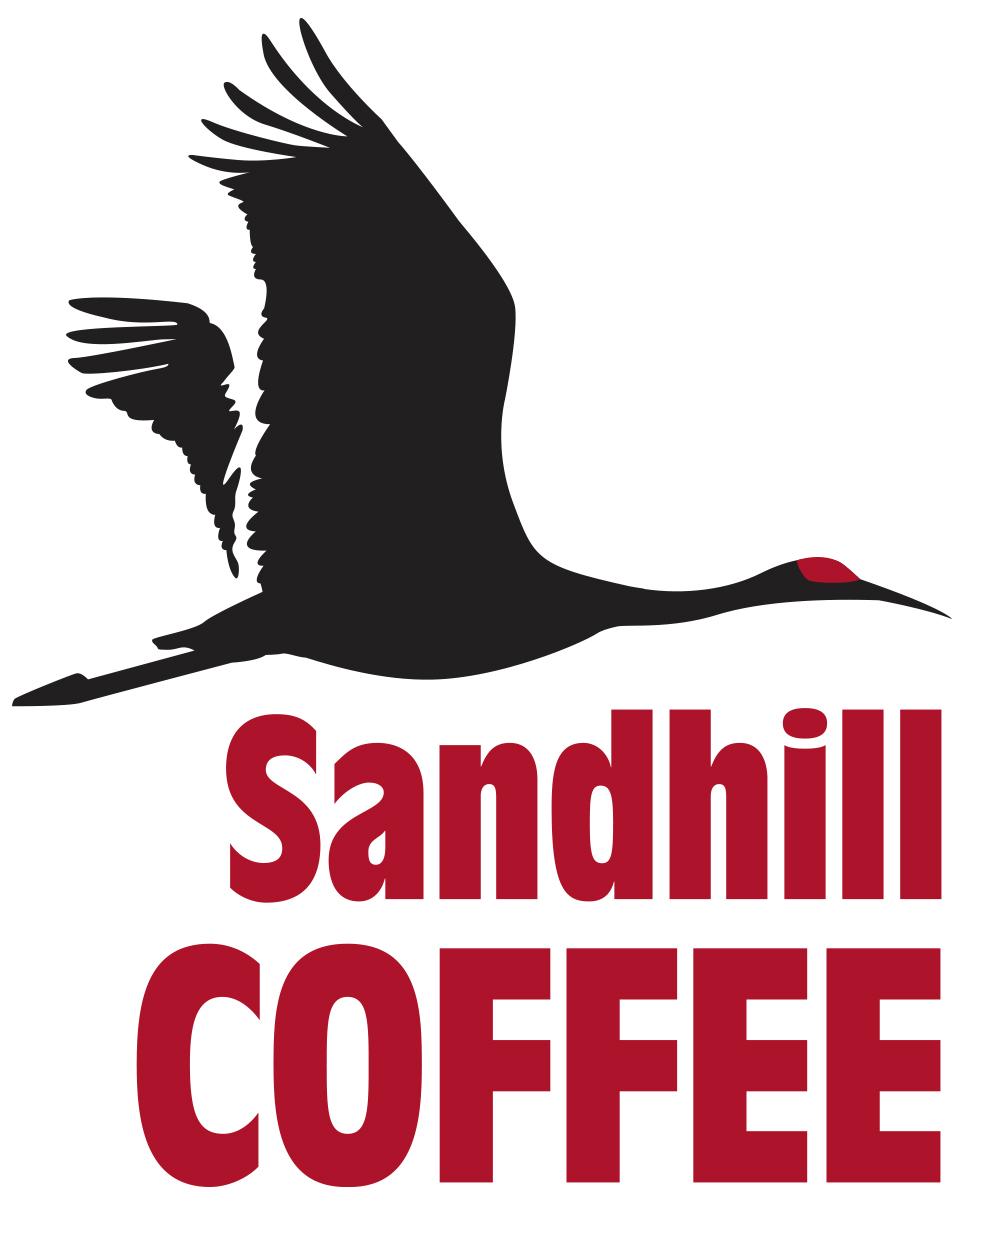 Sandhill Coffee